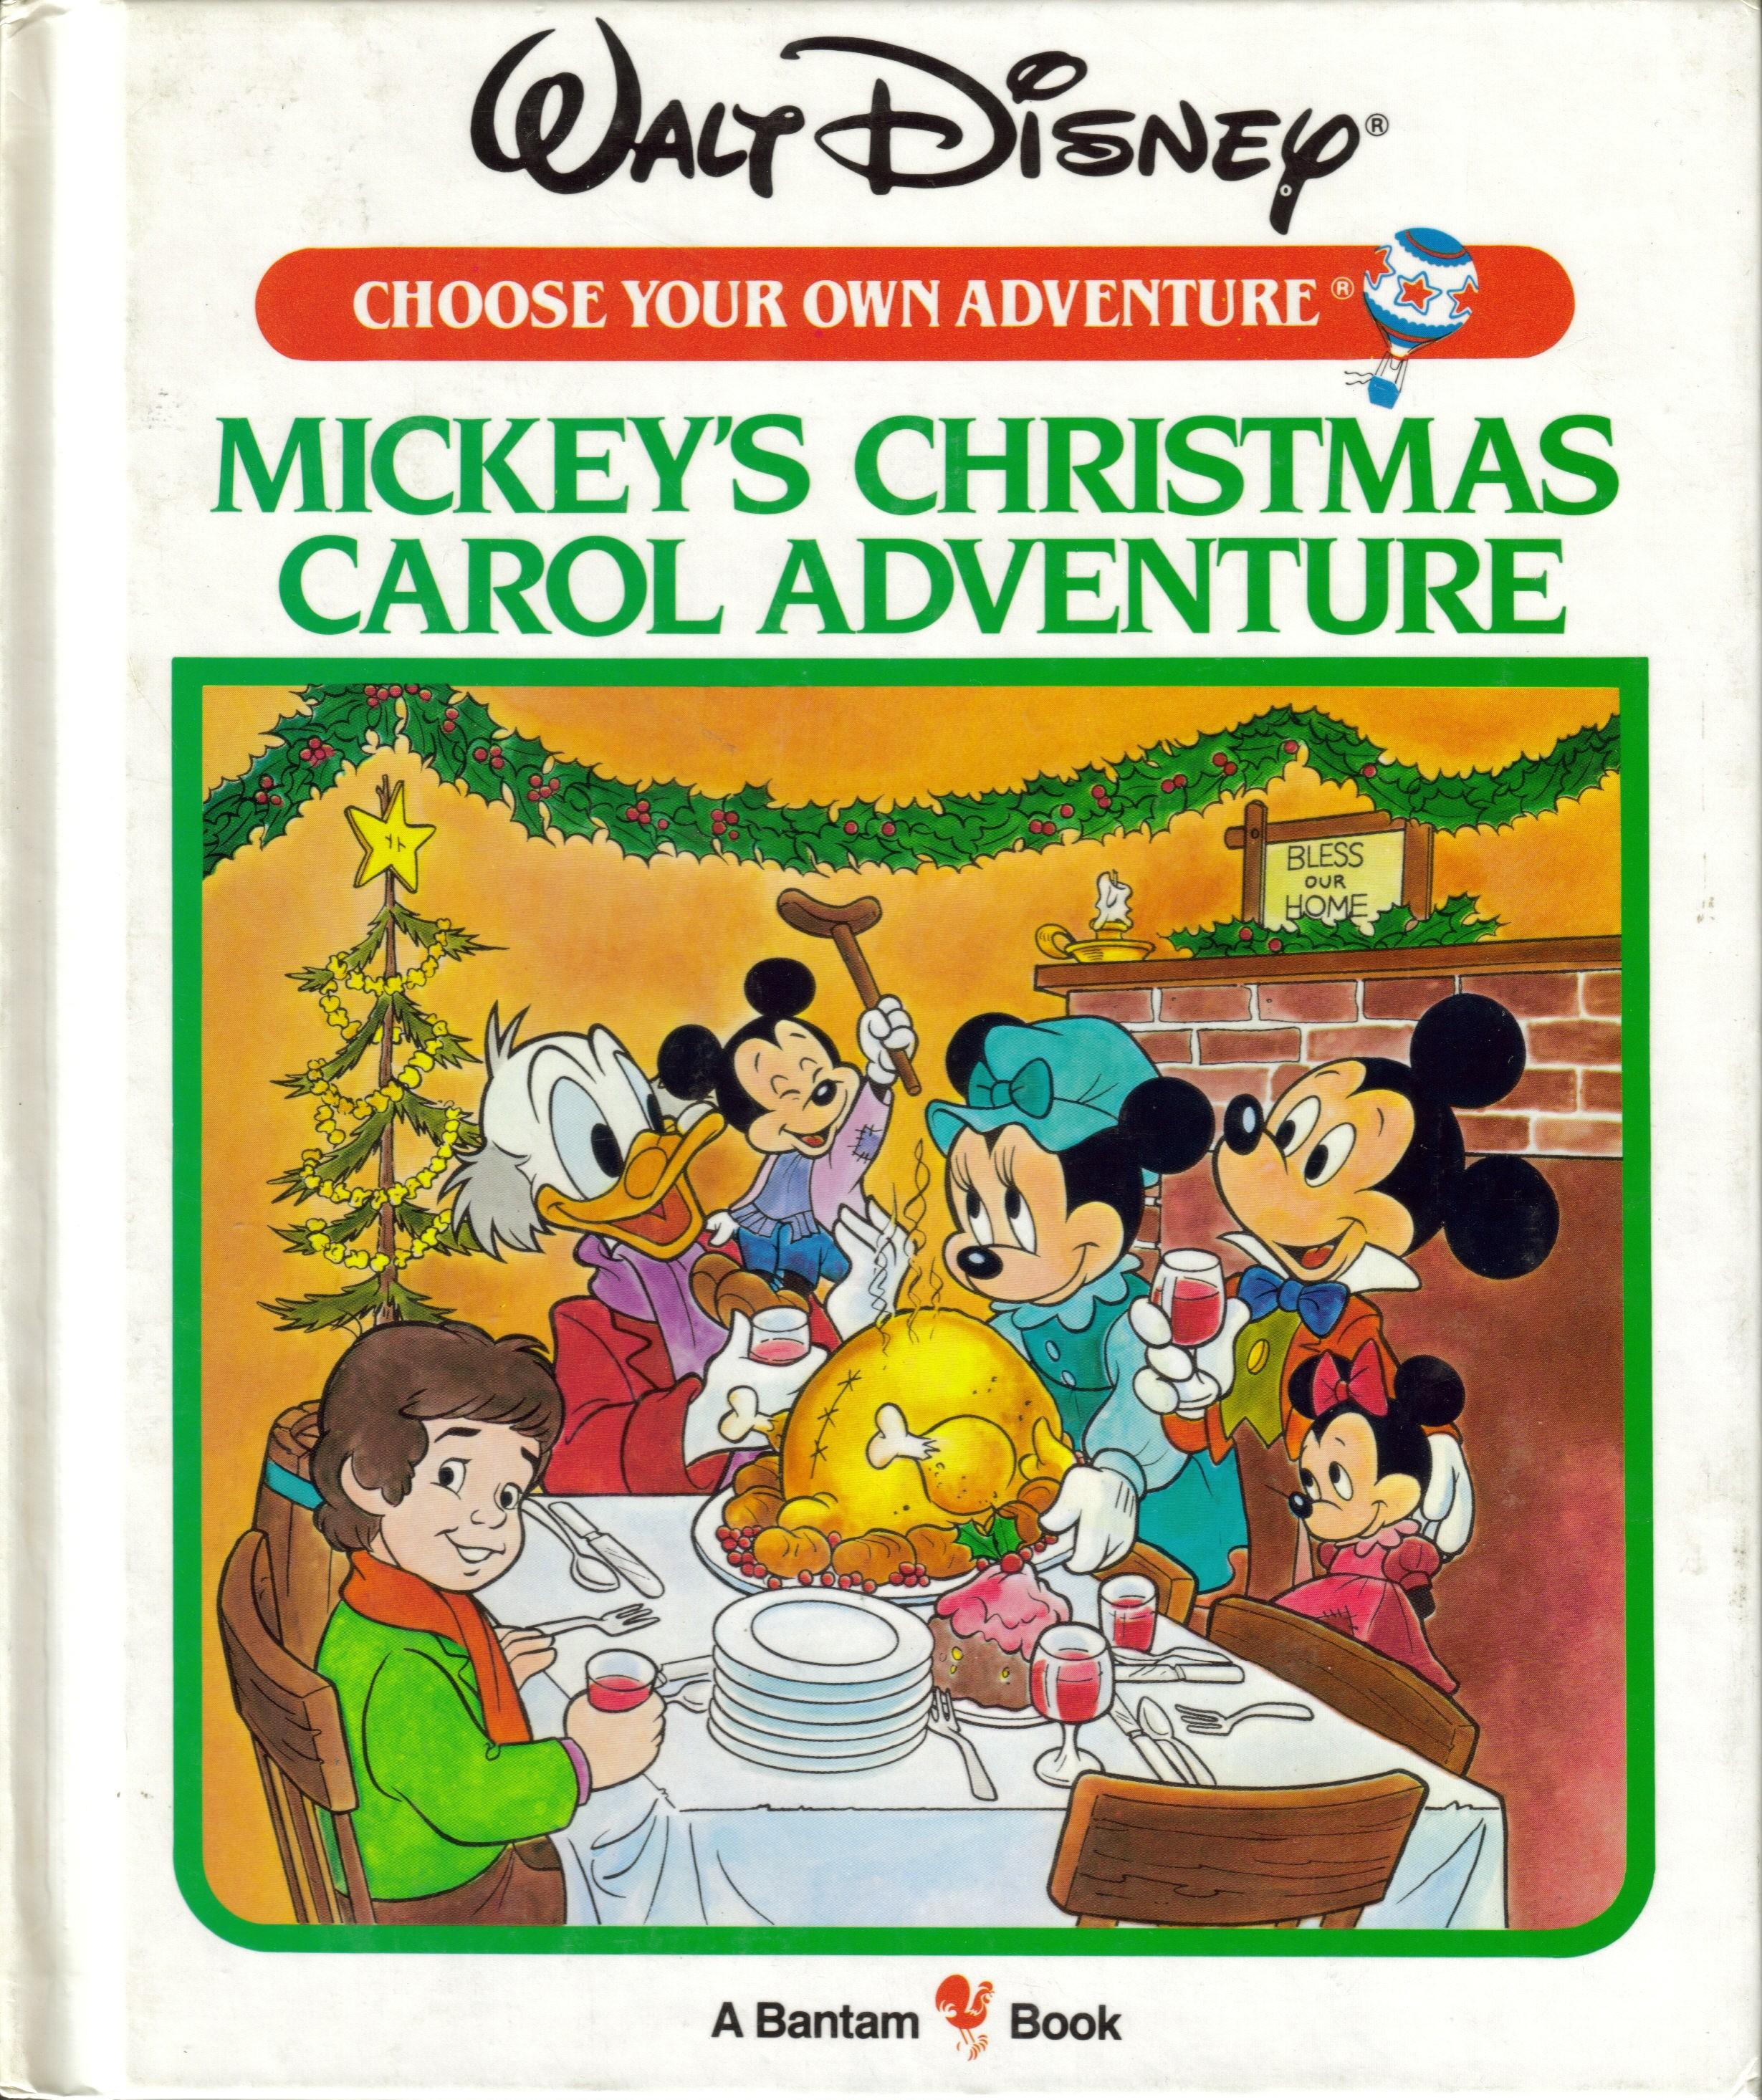 Mickeys Christmas Carol Book.Item Mickey S Christmas Carol Adventure Demian S